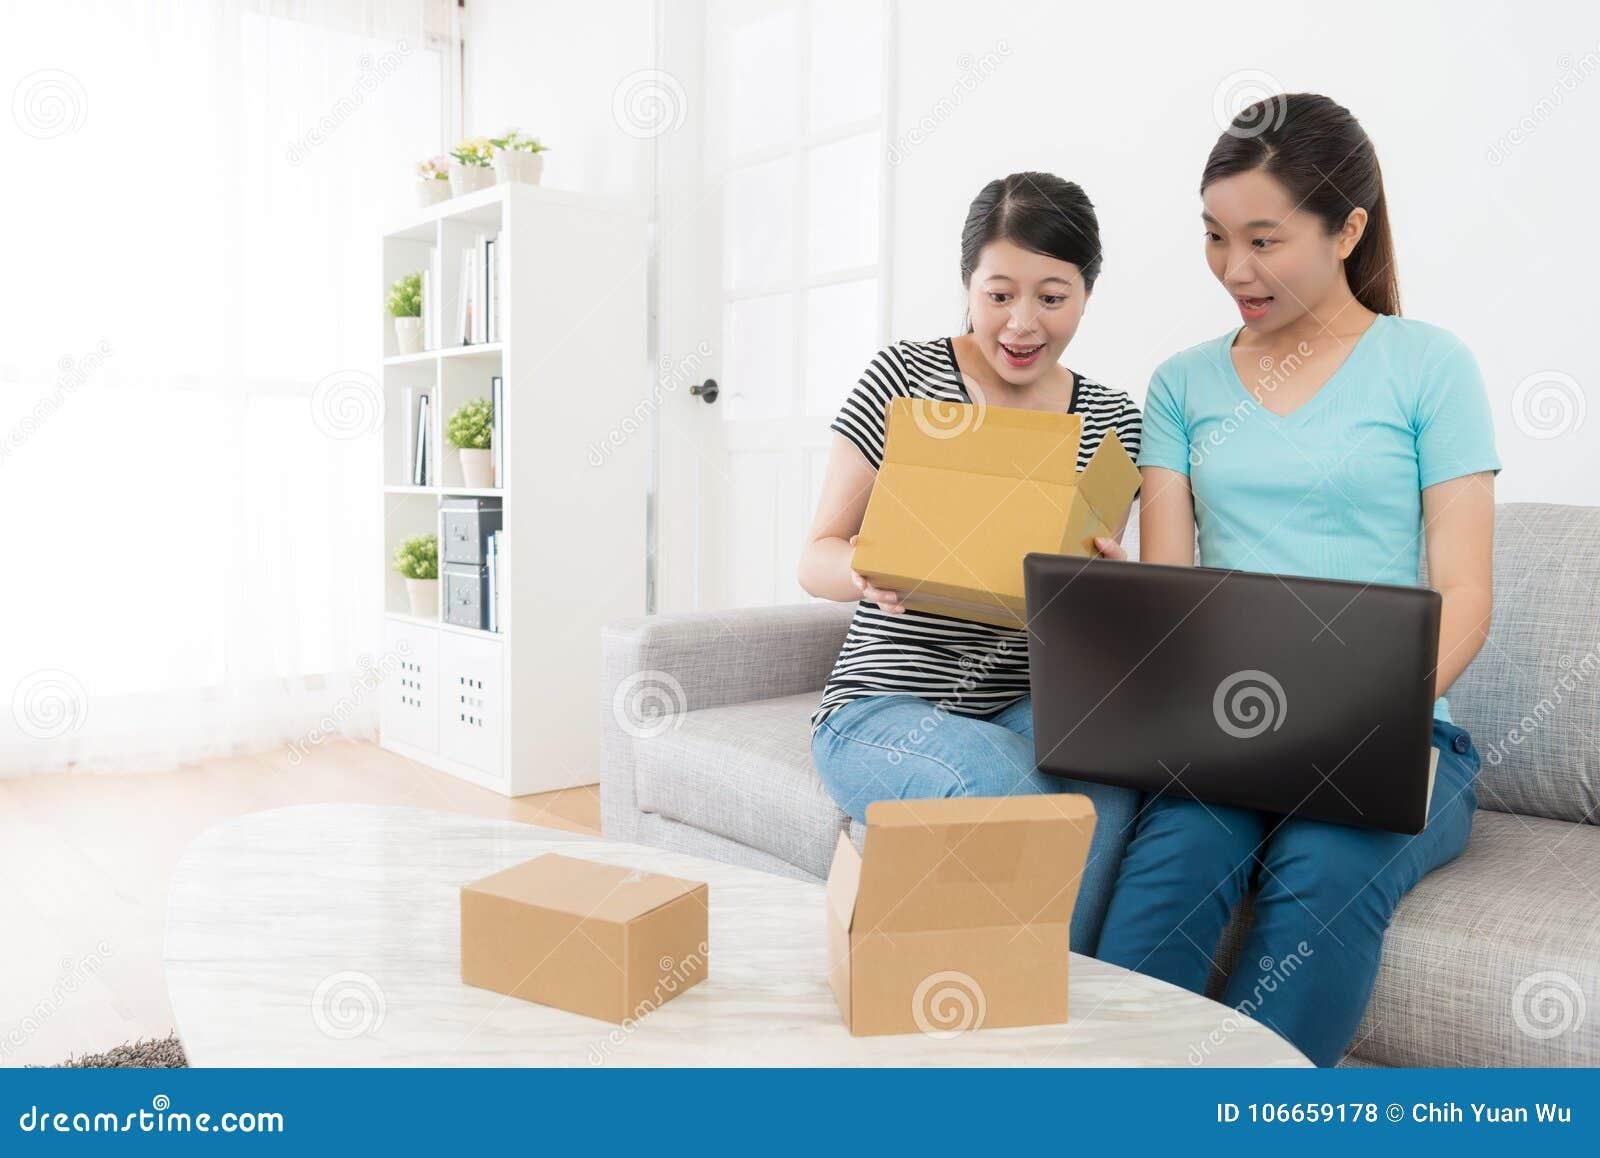 Finding girls online